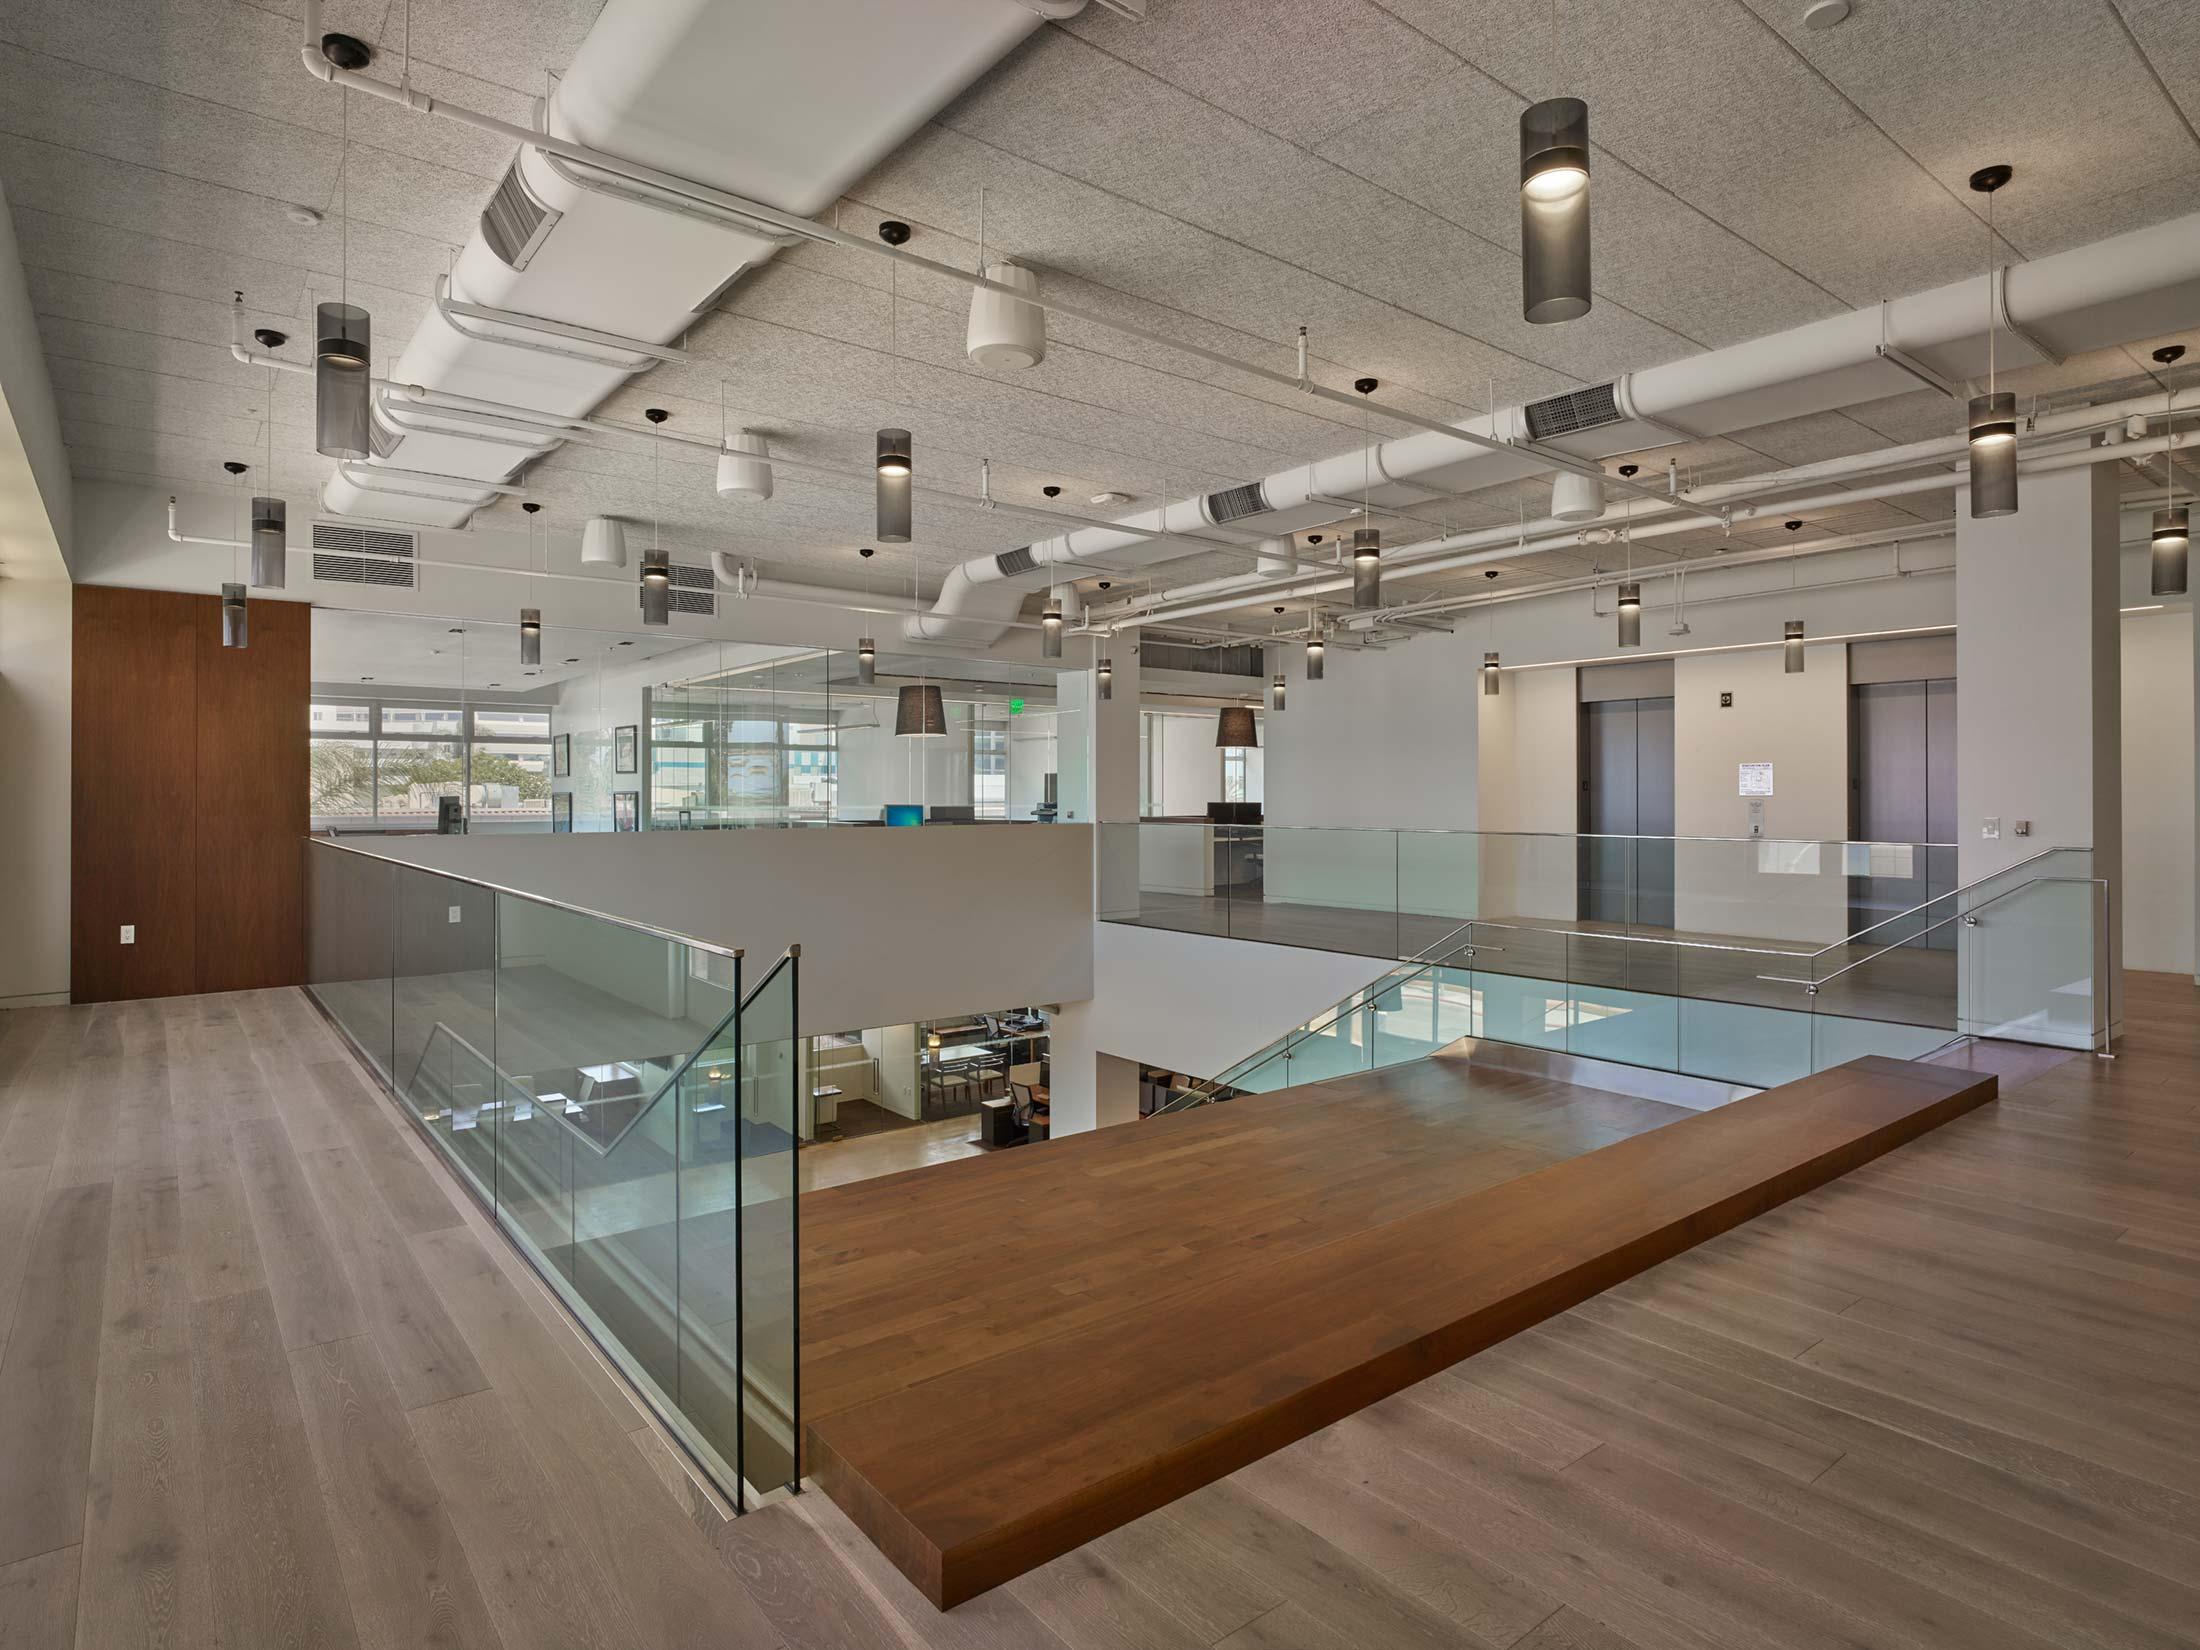 modern-architecture-commercial-interiors-office-california-shubindonaldson-truecar-ocean-01